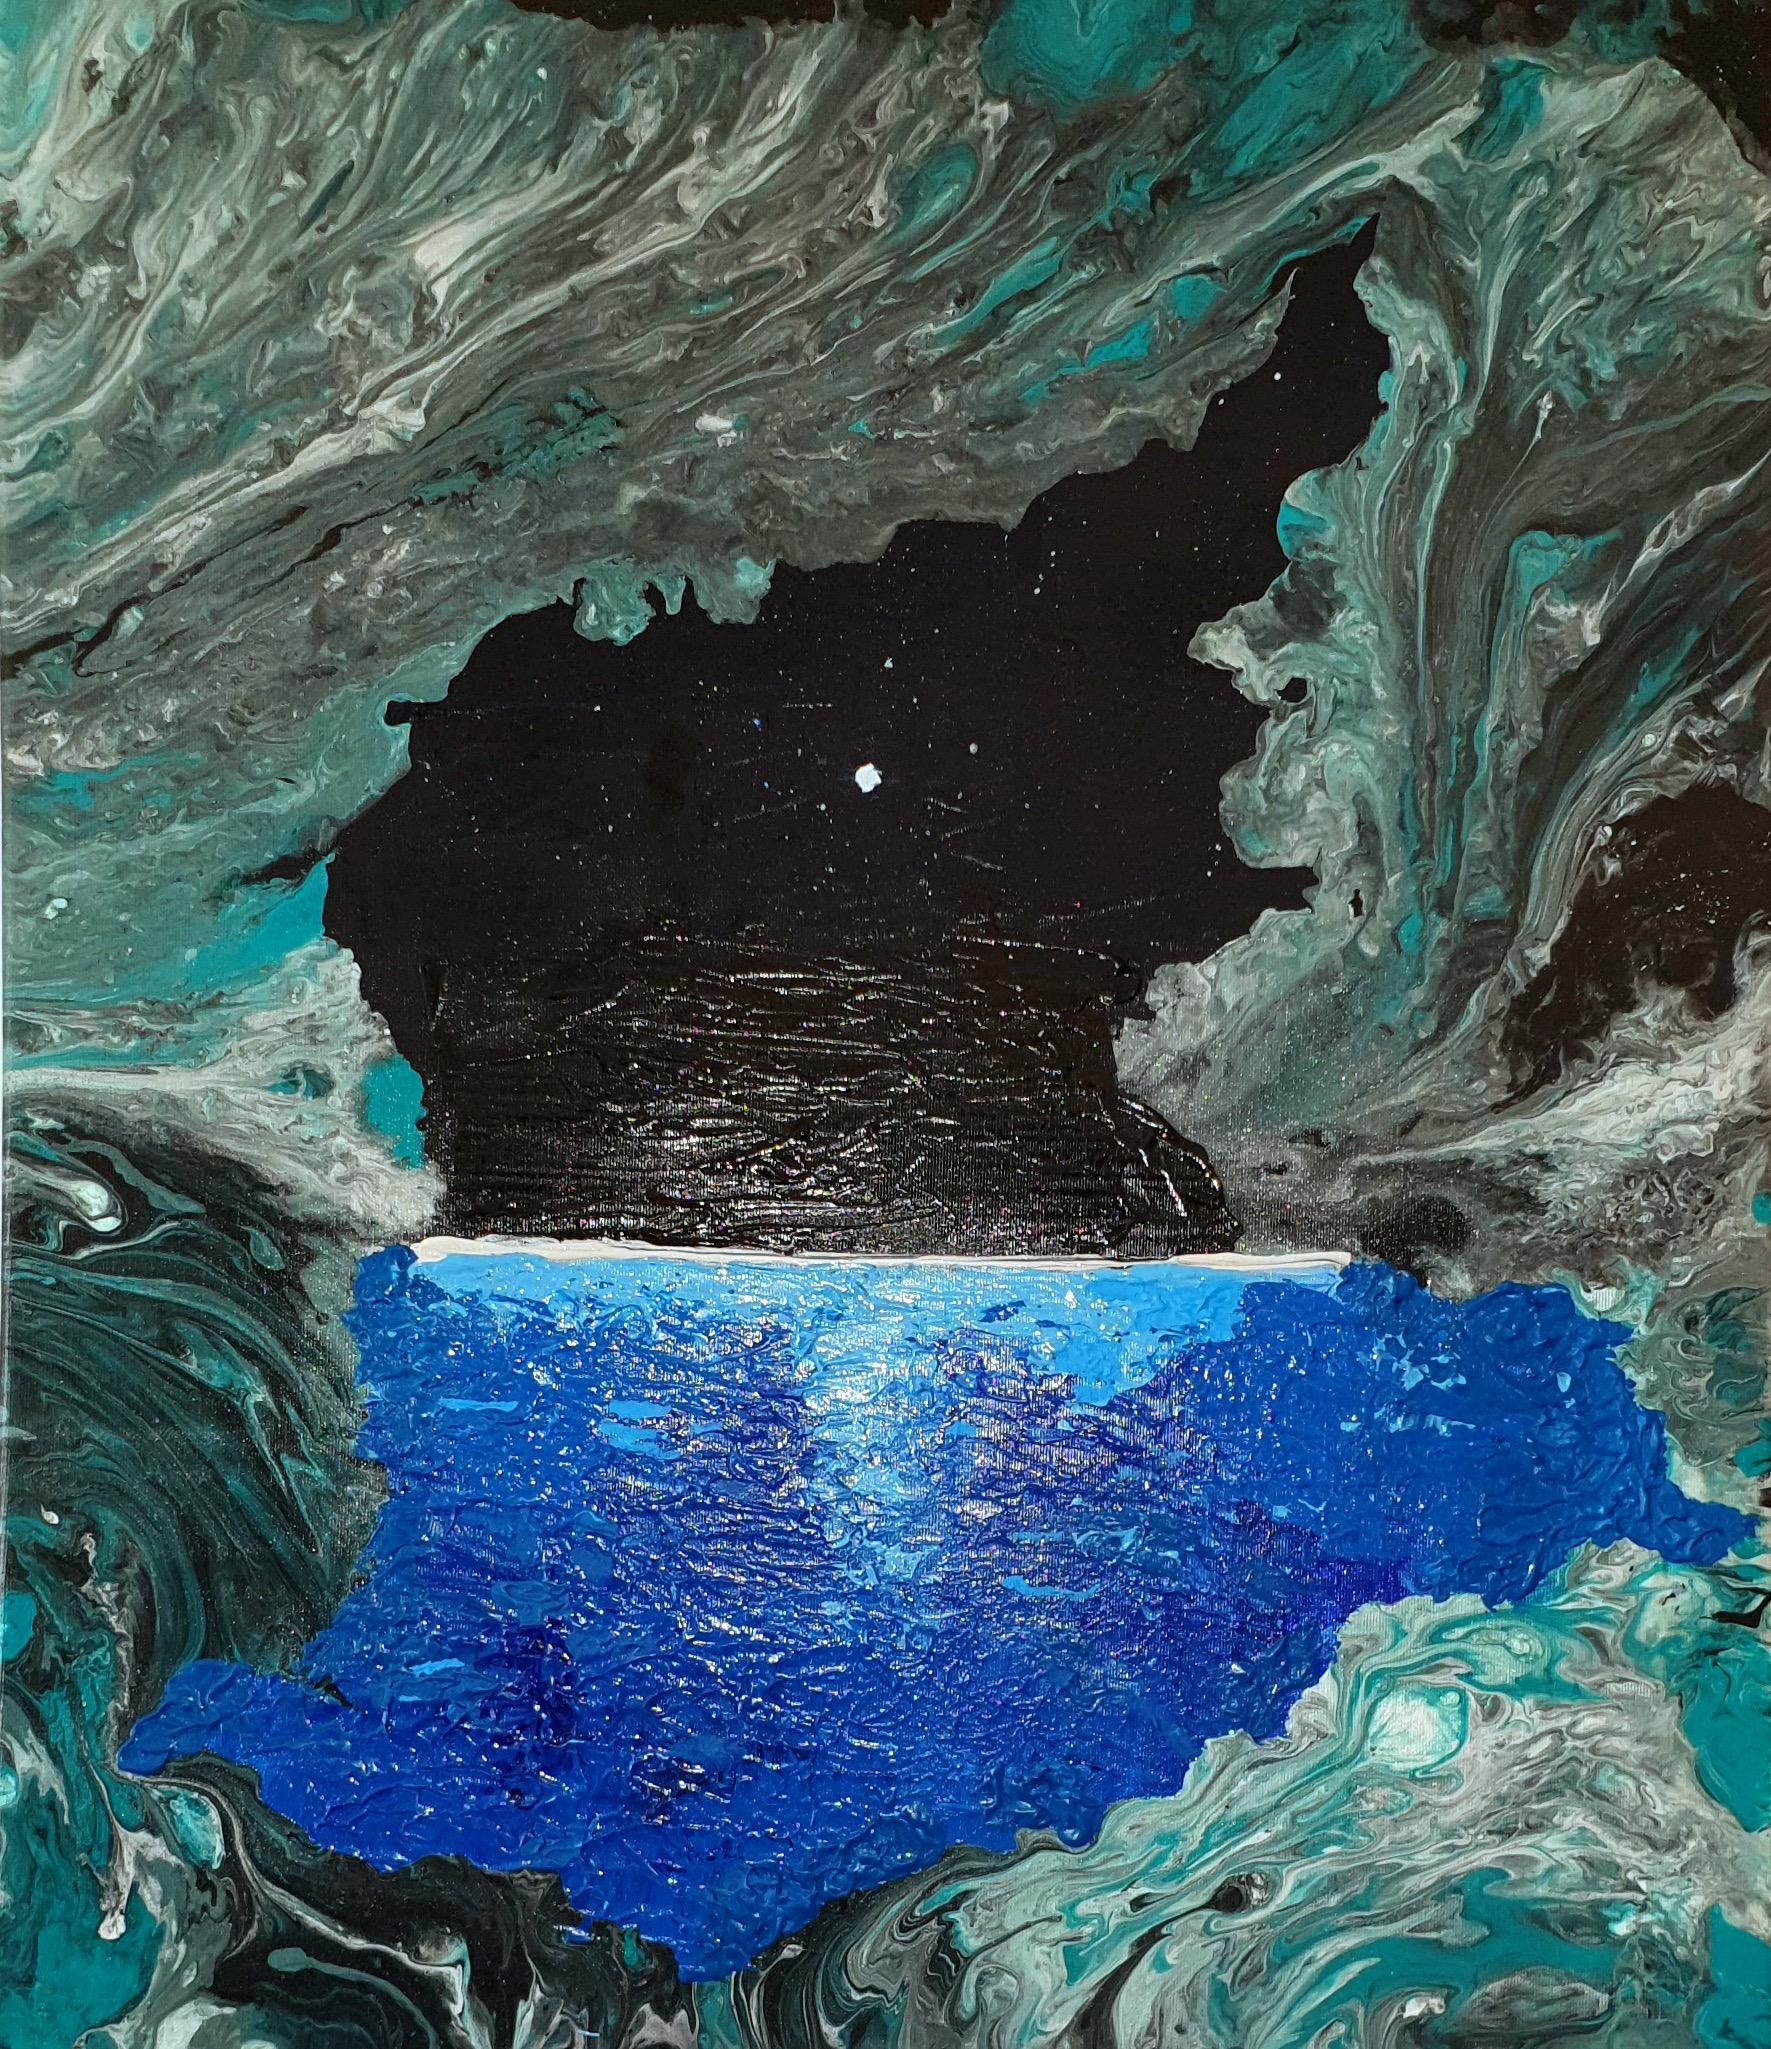 "Obraz akryl 60cm x 70cm pt. ""Okno"" (2020)"